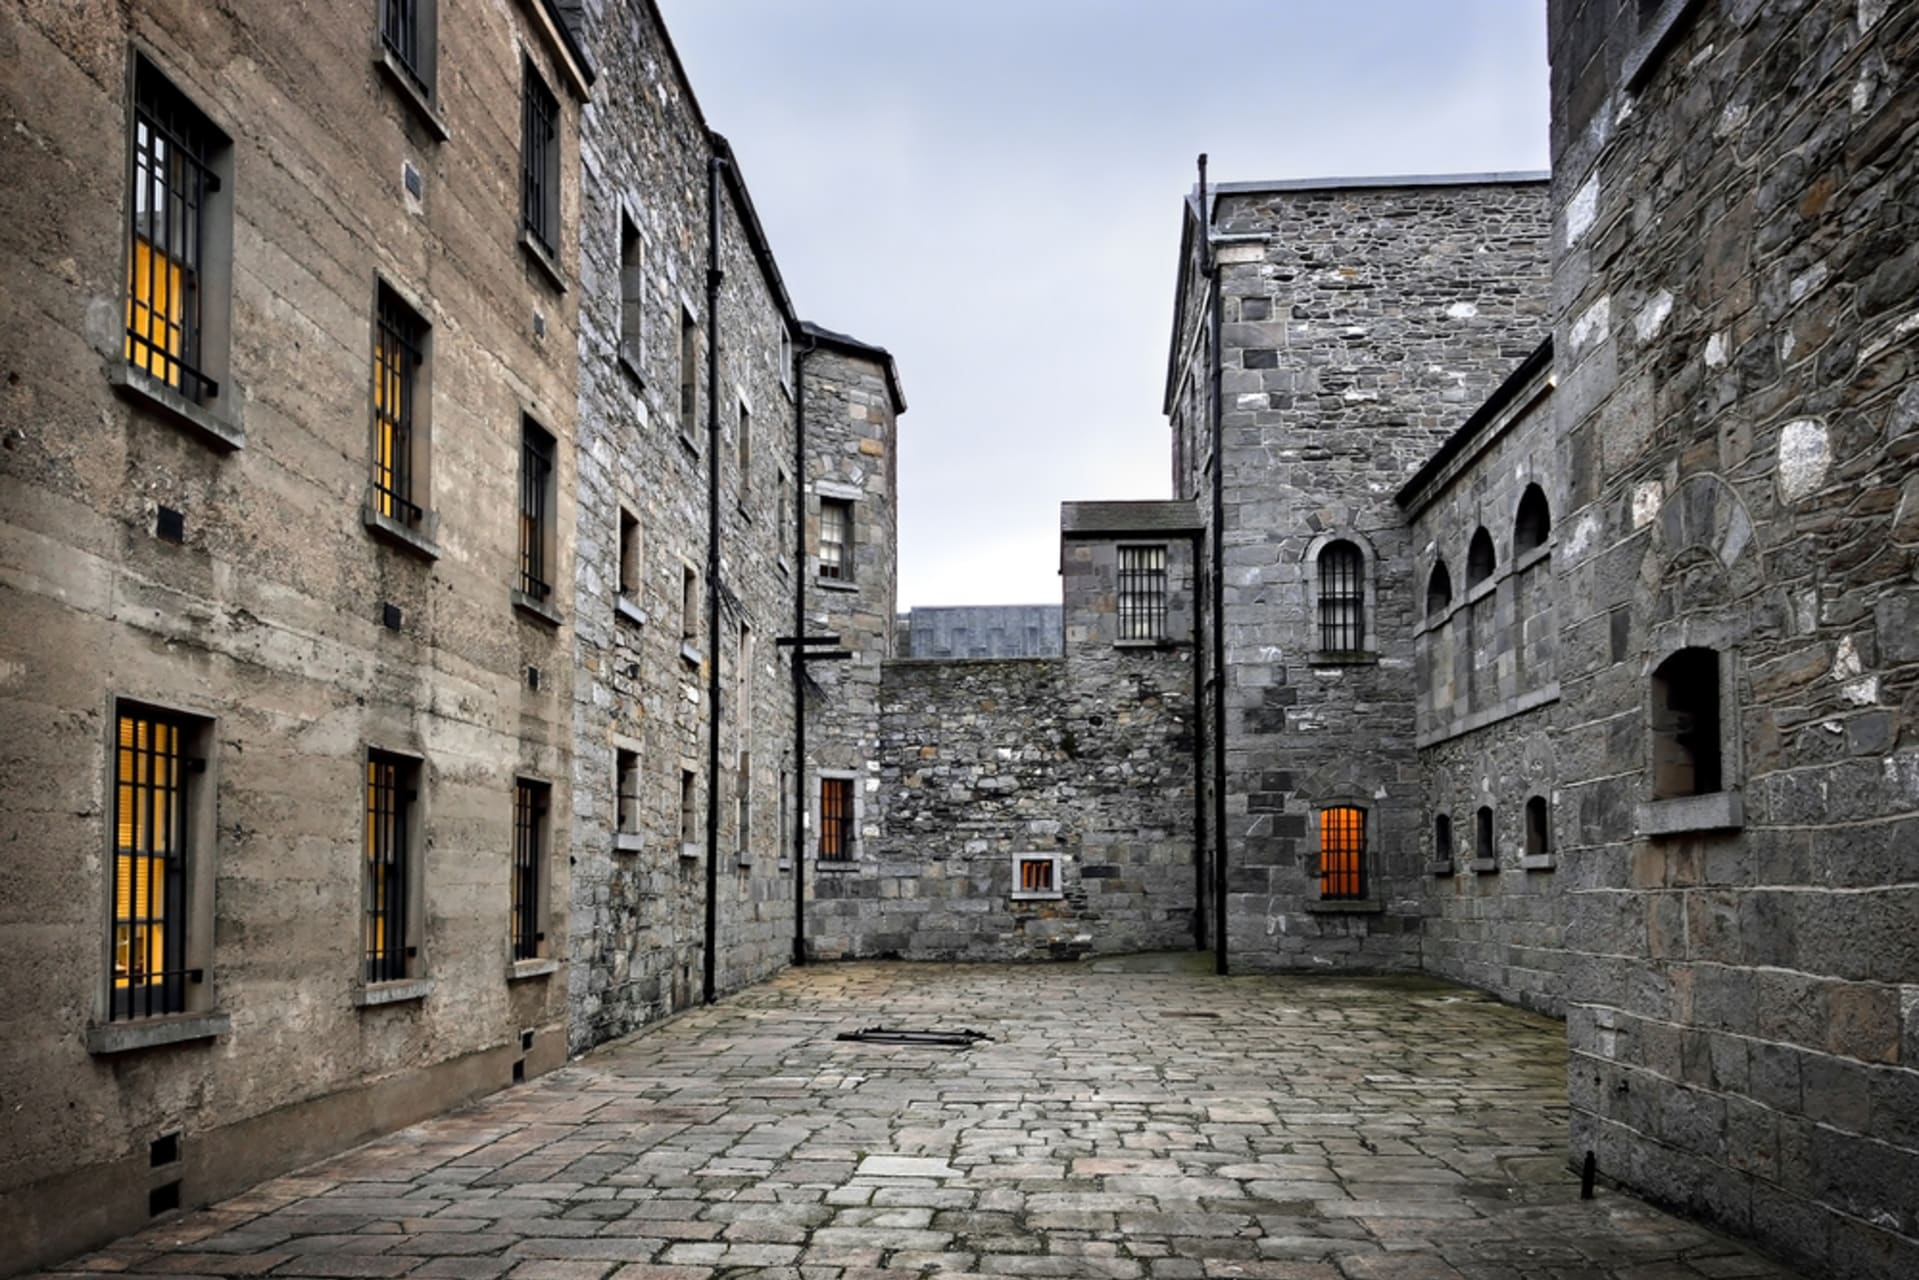 Dublin - Kilmainham Gaol, Heroes and Villains